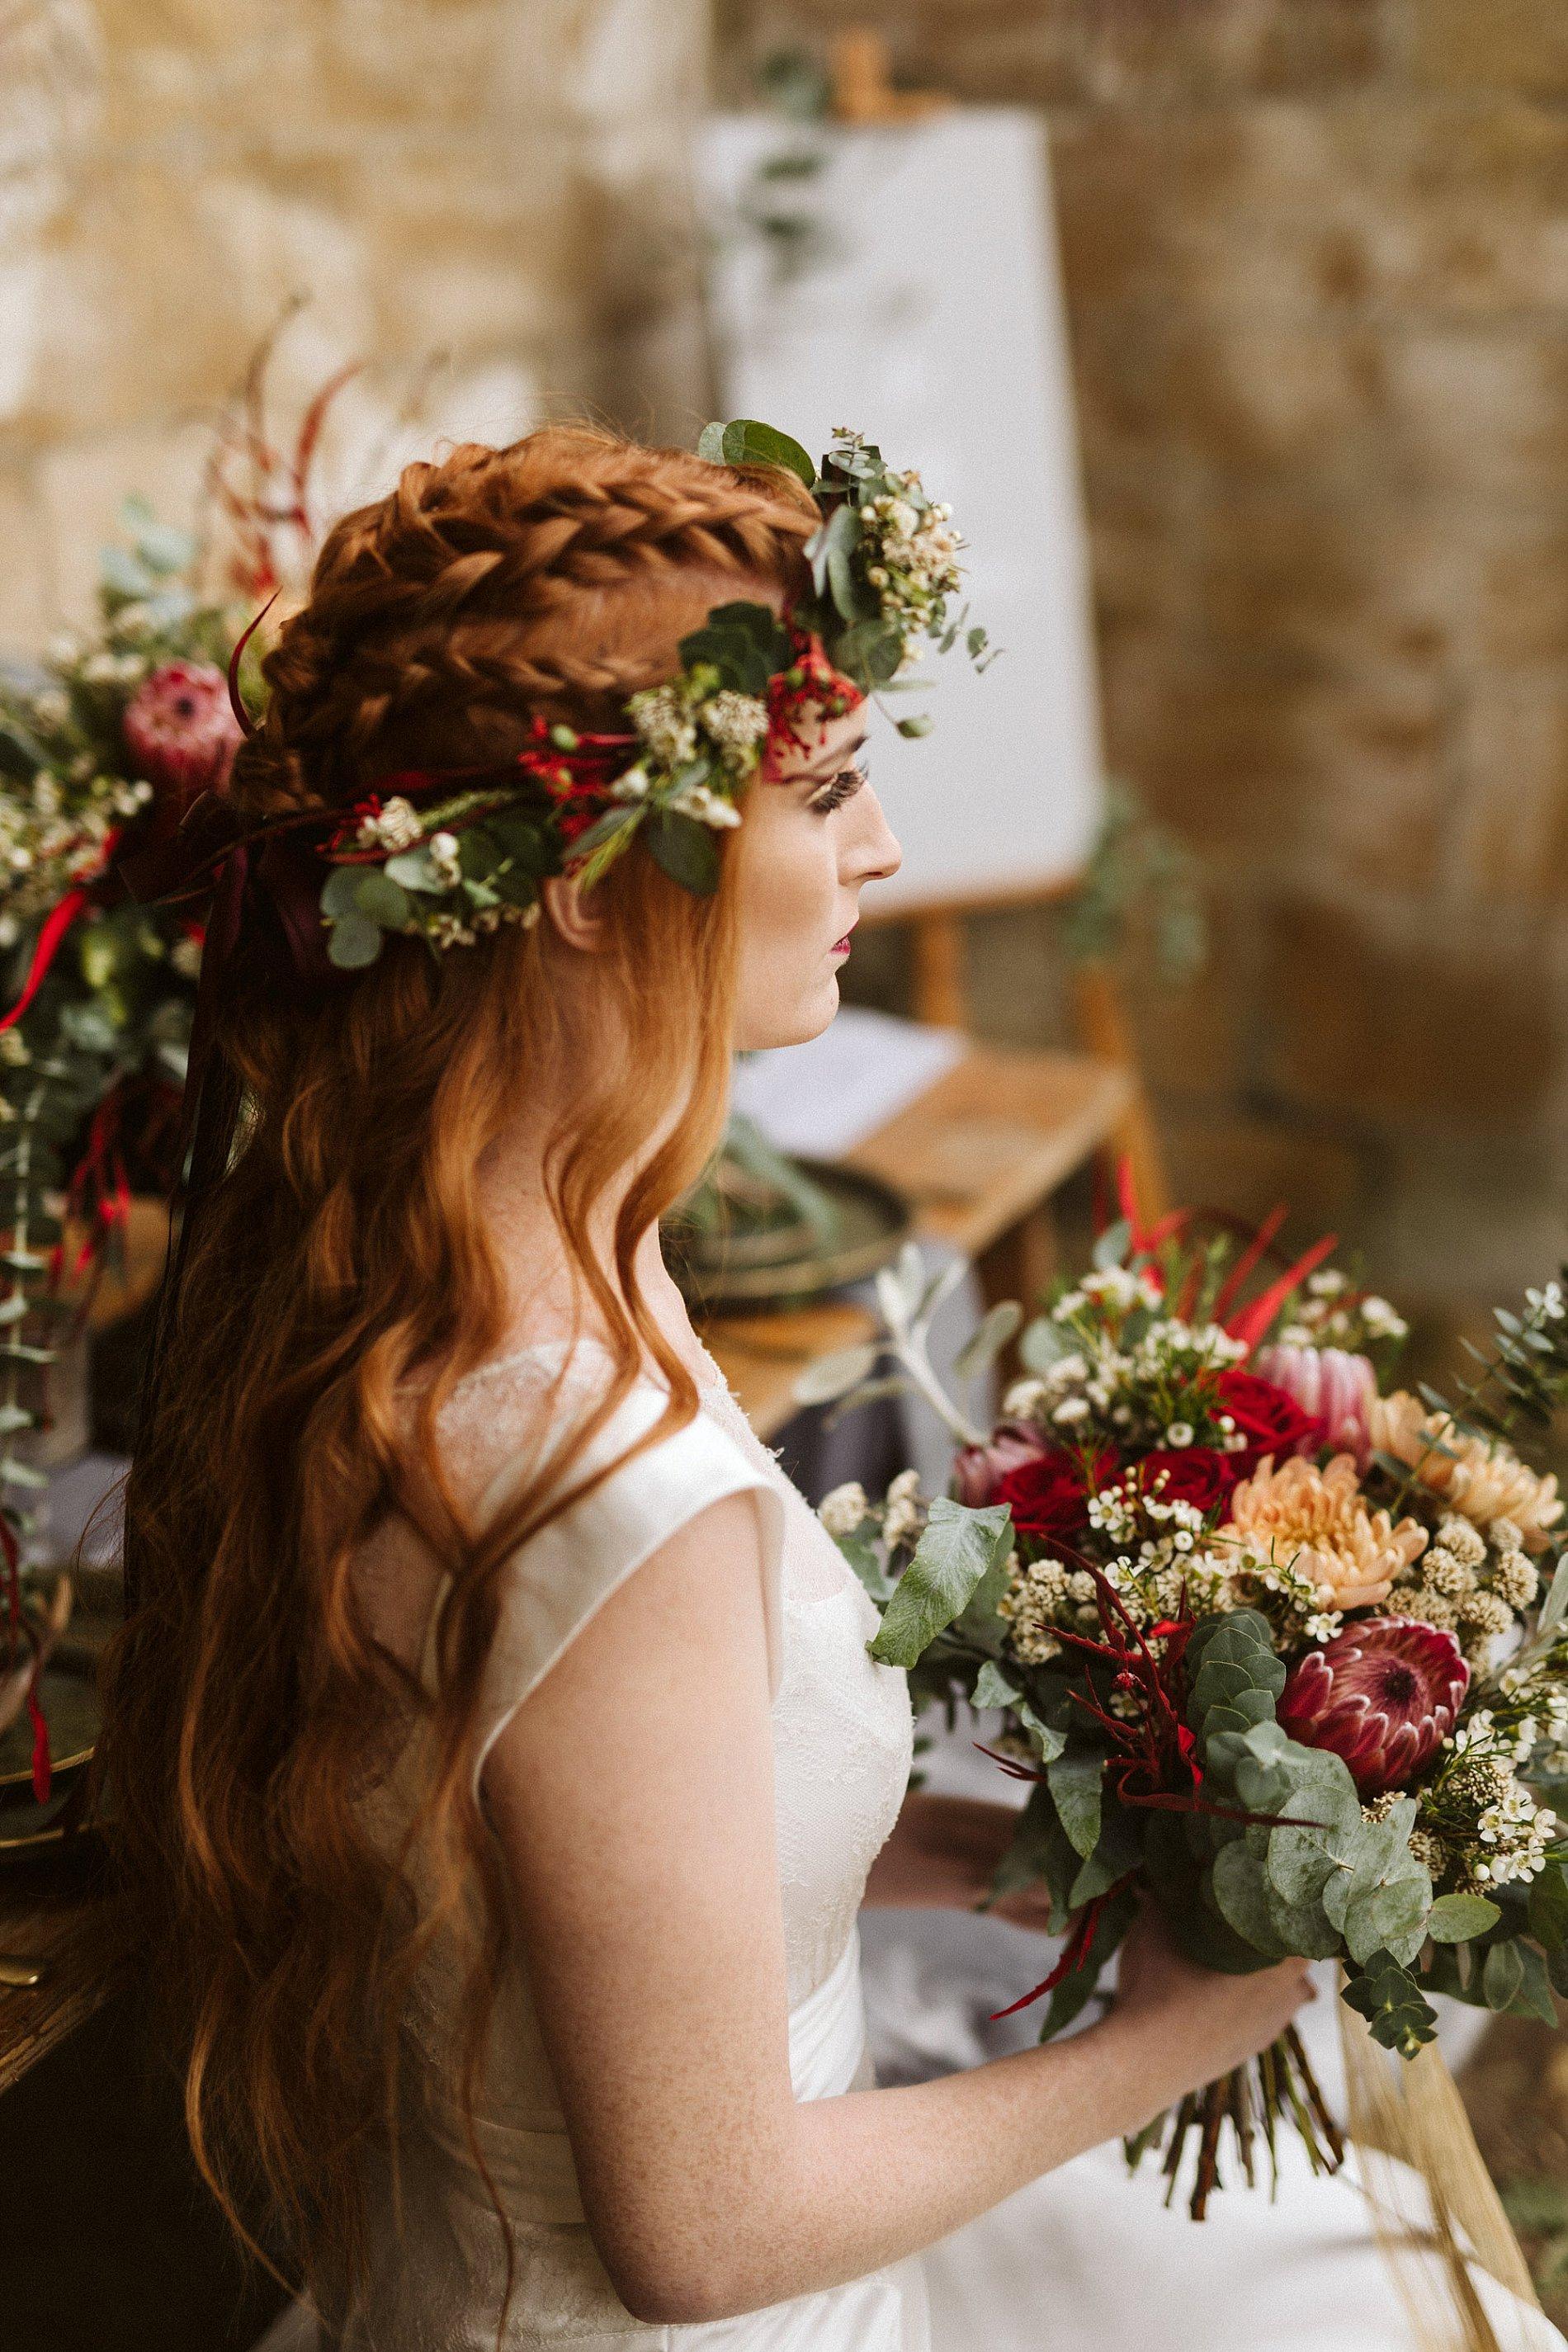 Game of Thrones Creative Bridal Shoot (c) Freya Raby (16)